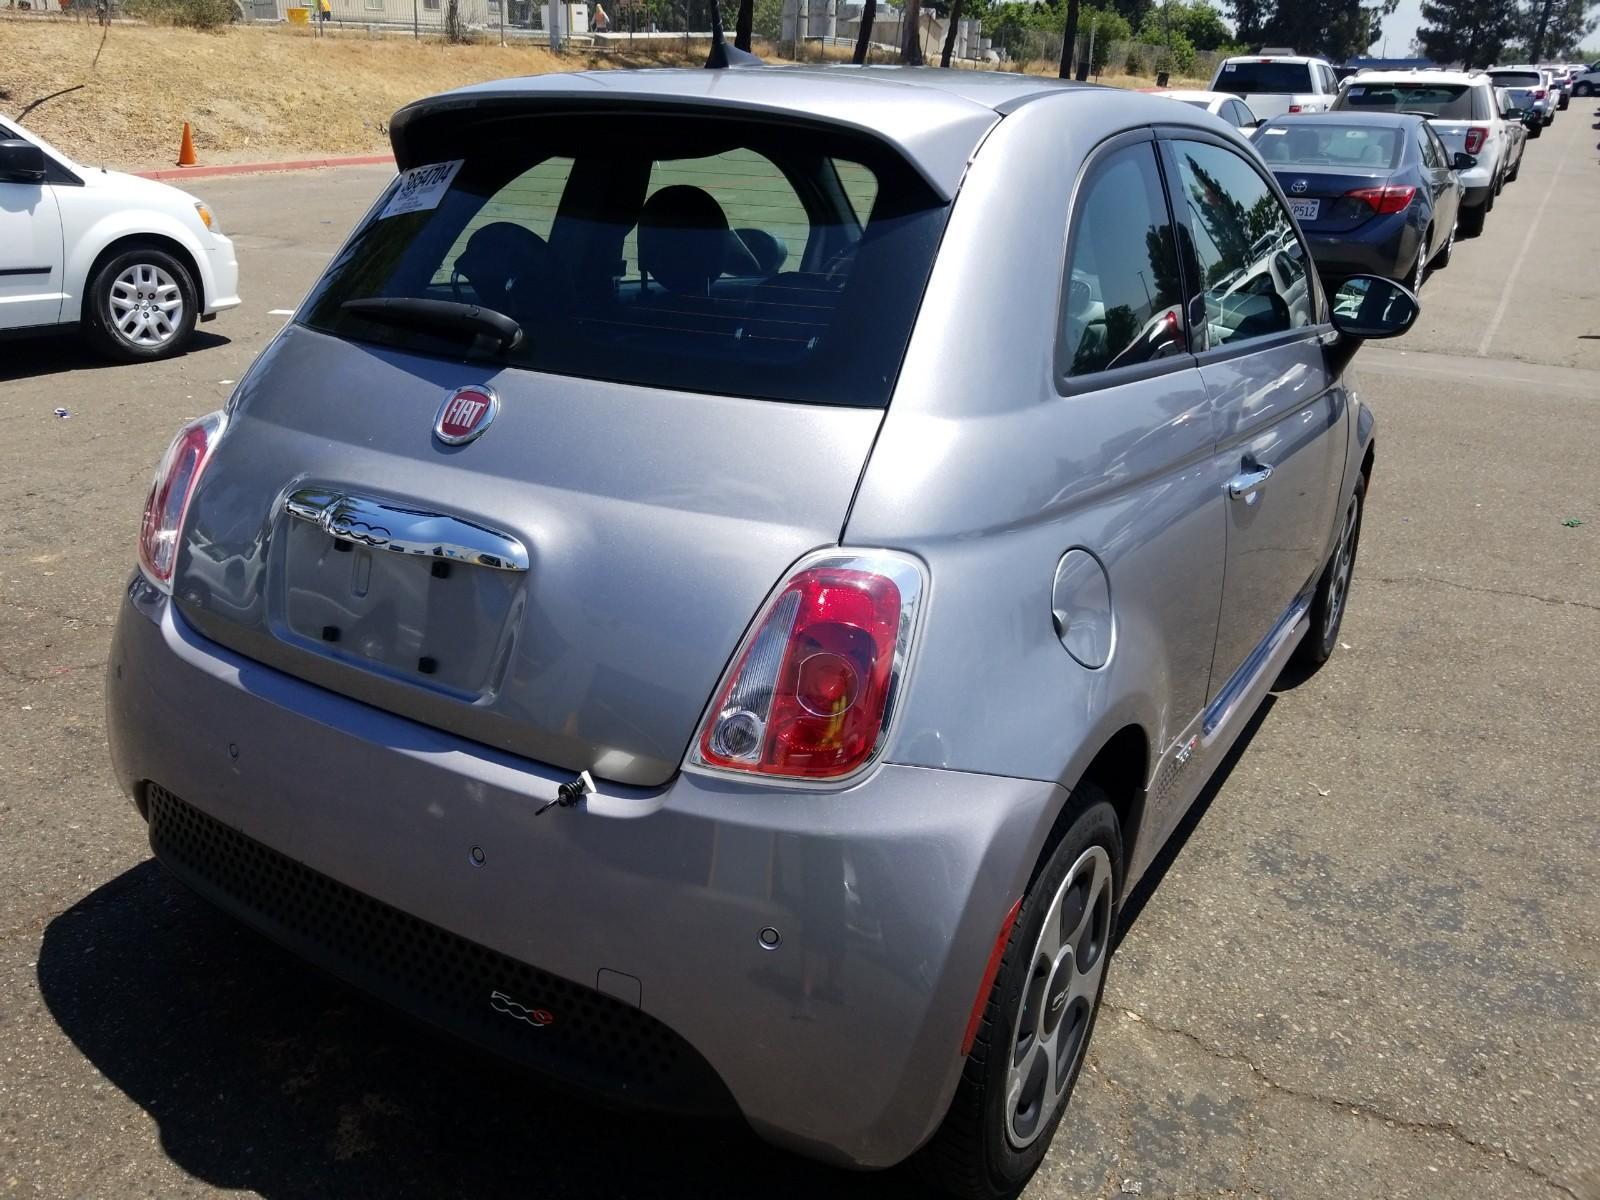 http://autocredit.com.ua/electro-cars/uploads/11/21-02-20/8GjV59_qdxMAfW0za.jpeg